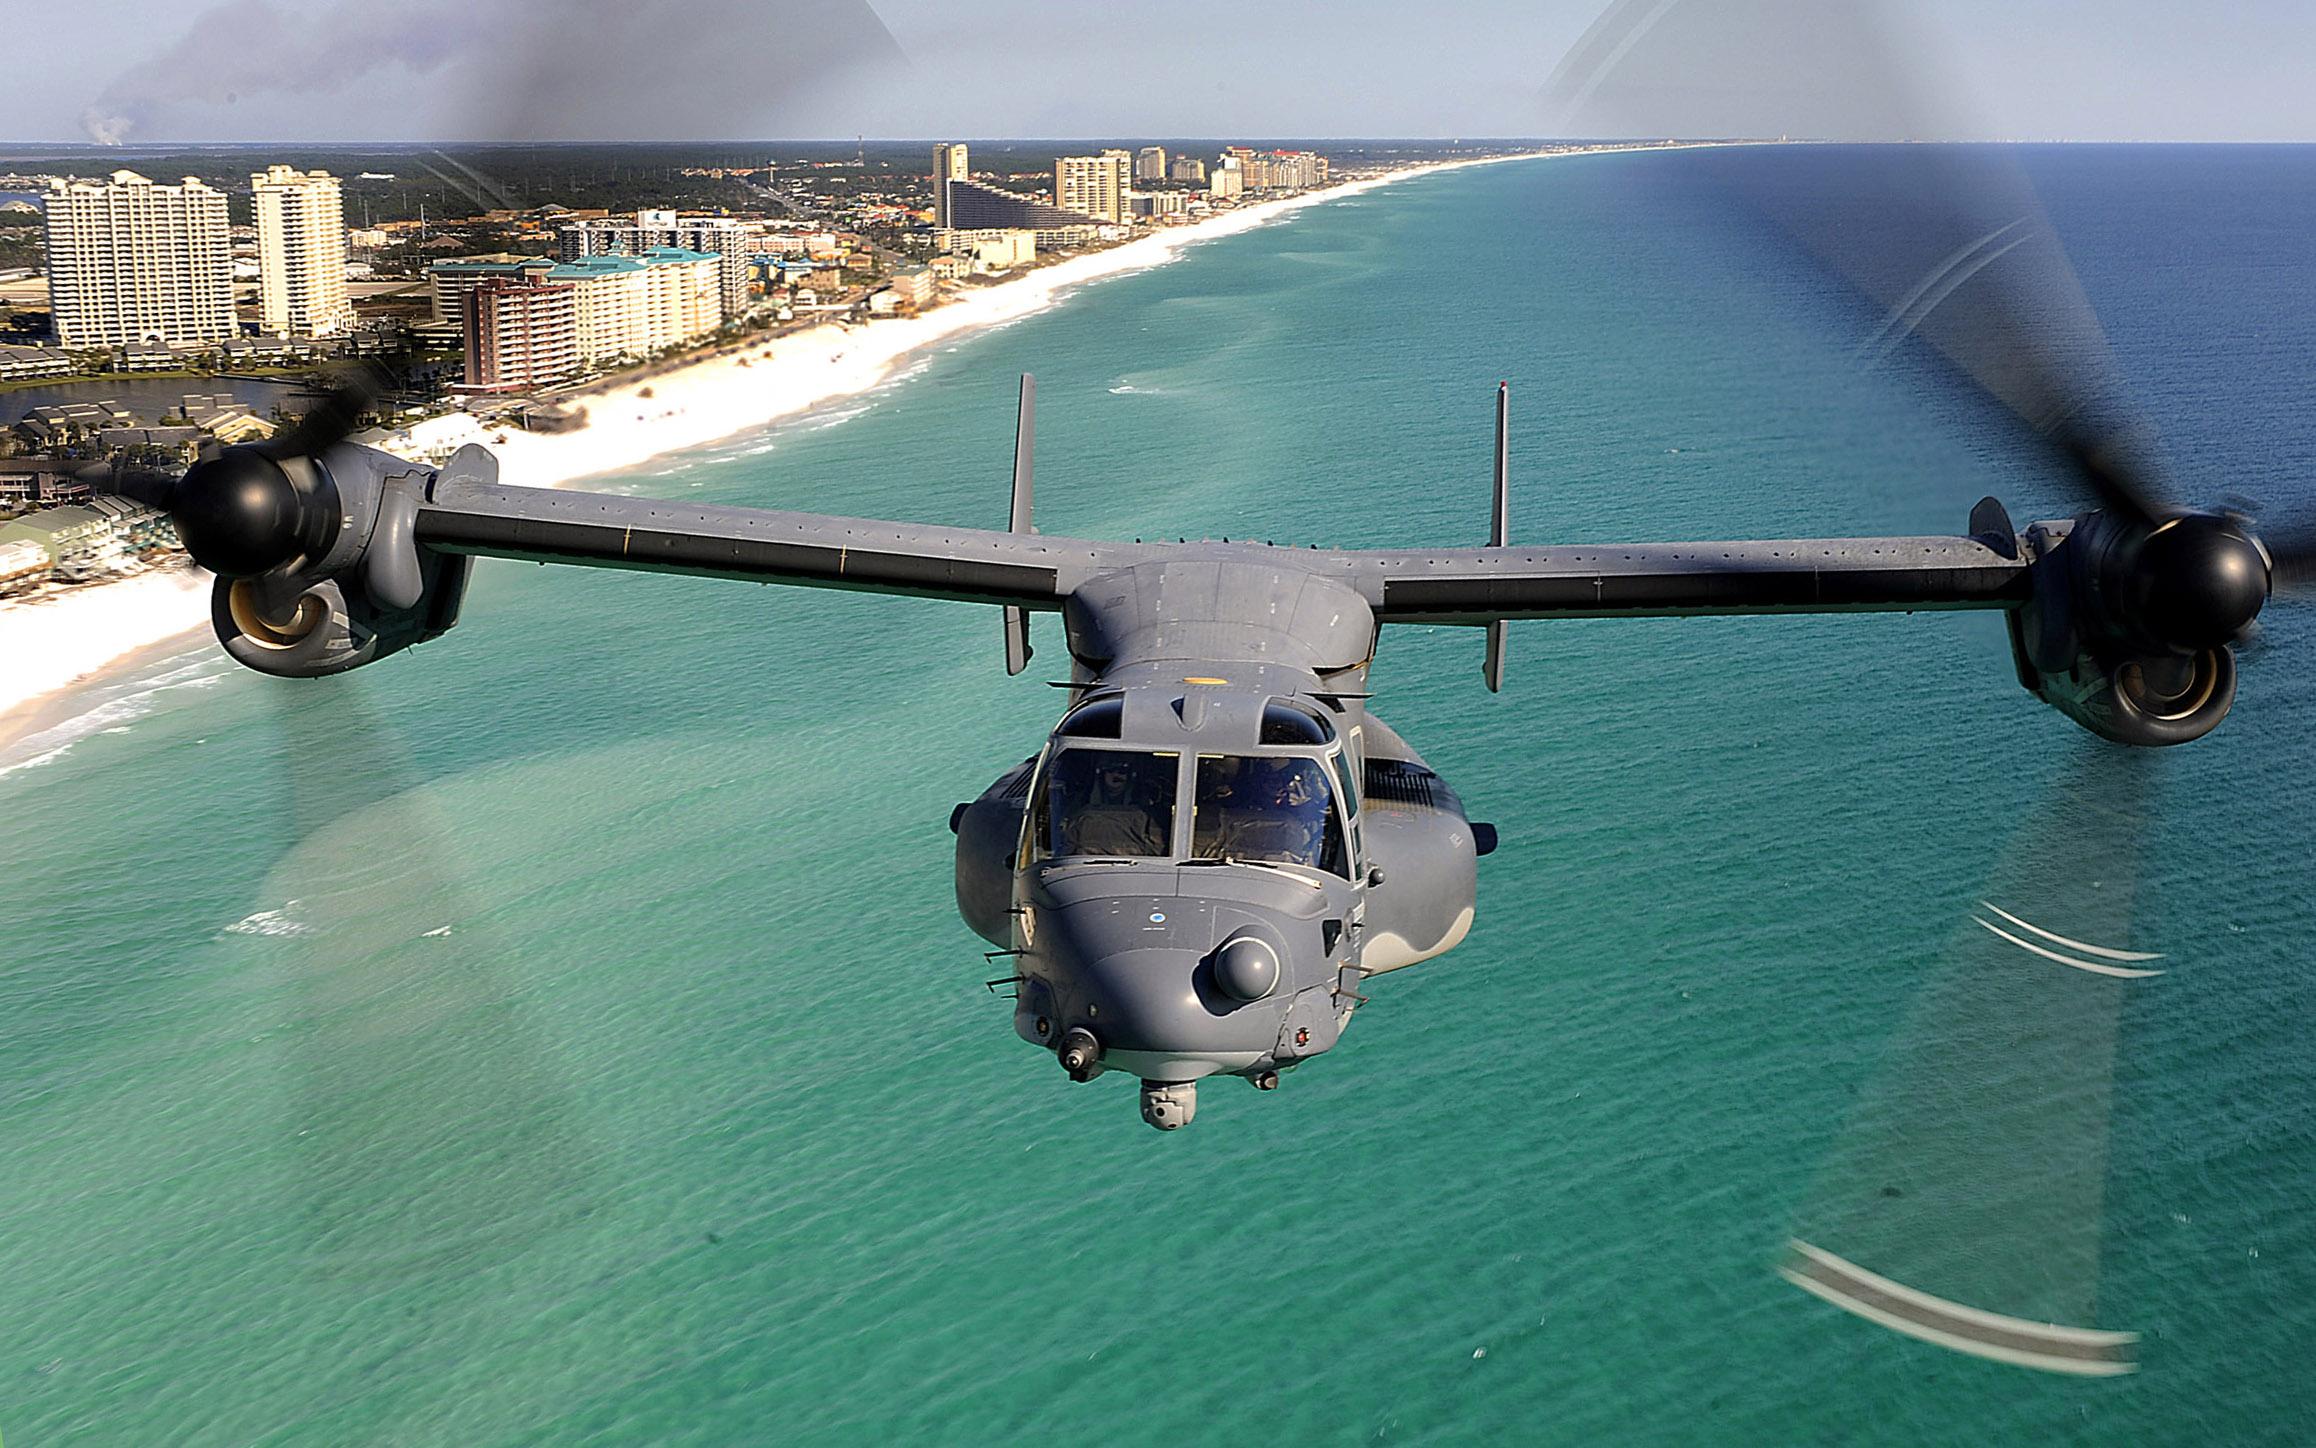 File:CV-22 Osprey flies over the Emerald Coast.JPG ...